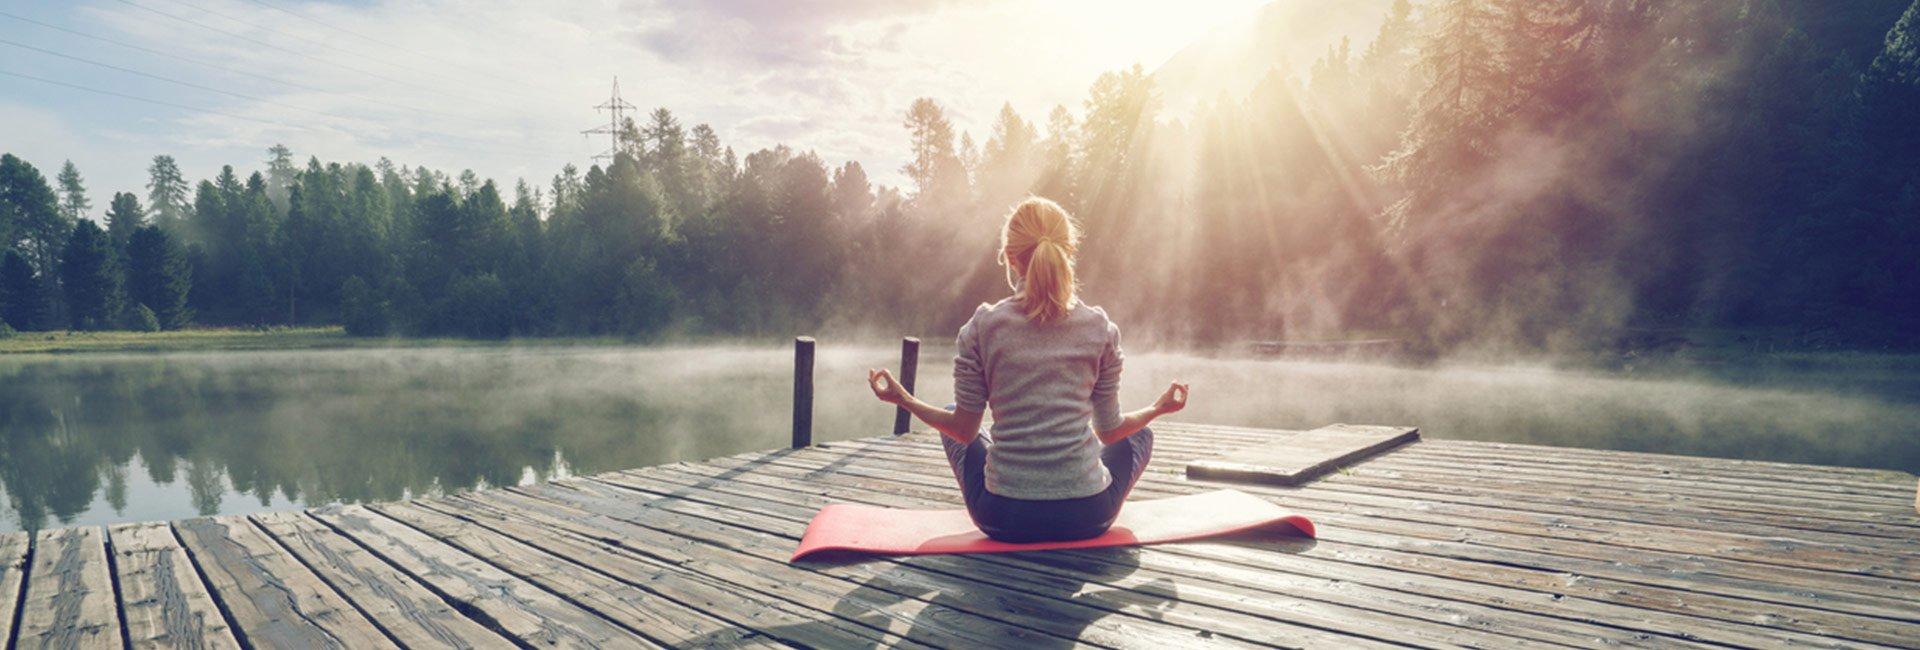 leigh cowlishaw on mindfulness and wellbeing